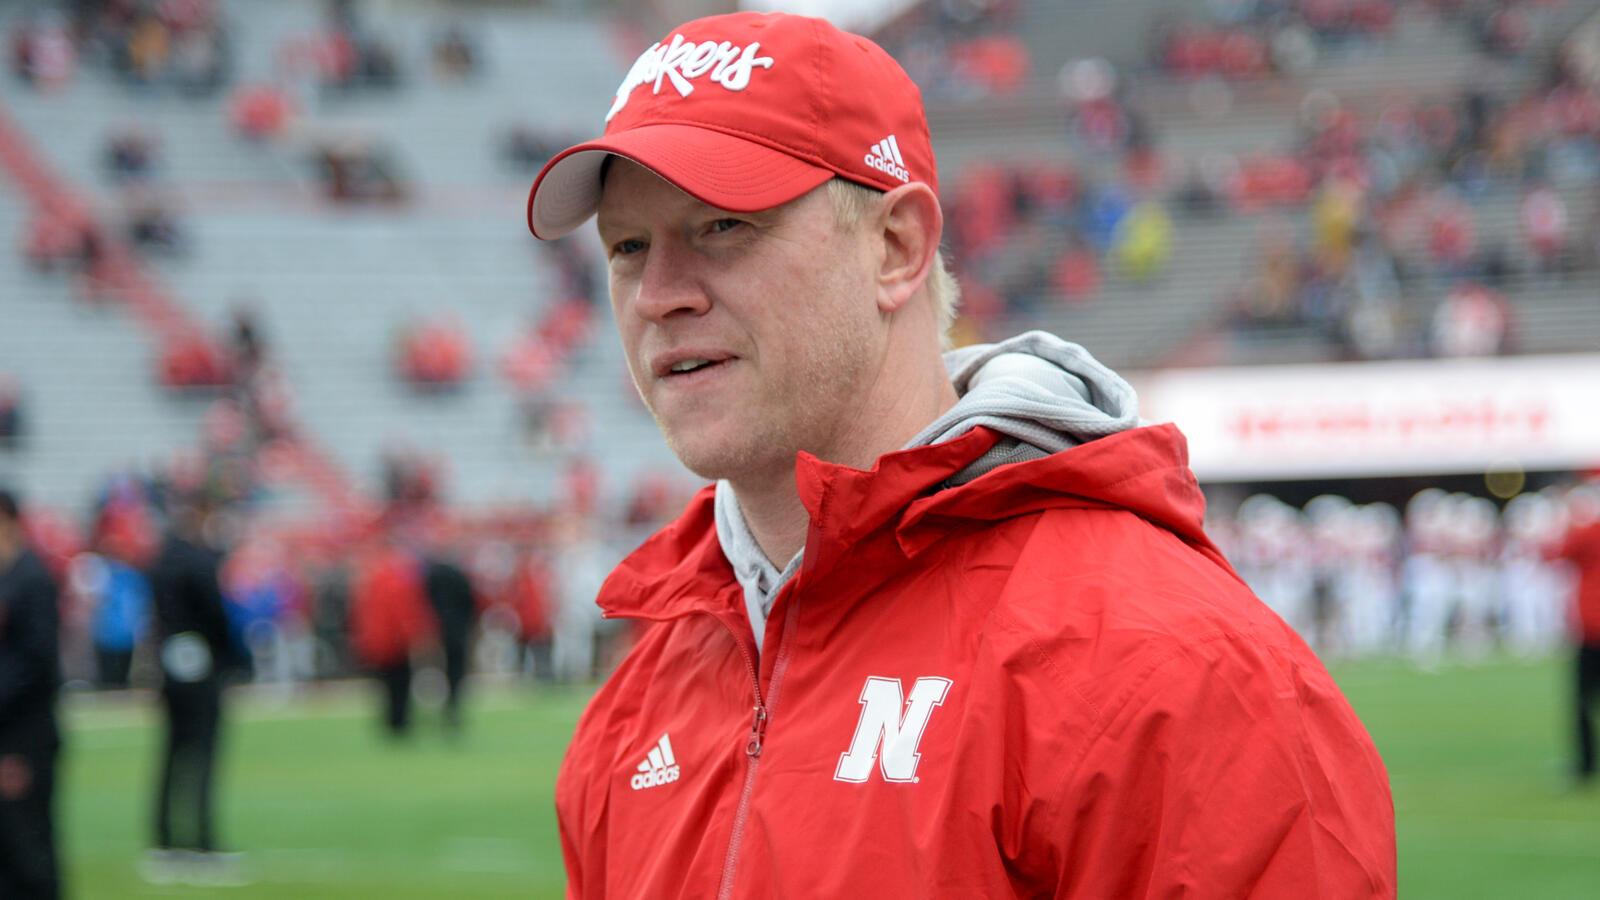 CELLULAR ADVANTAGE POLL: Will You Watch The Nebraska-Illinois Game?